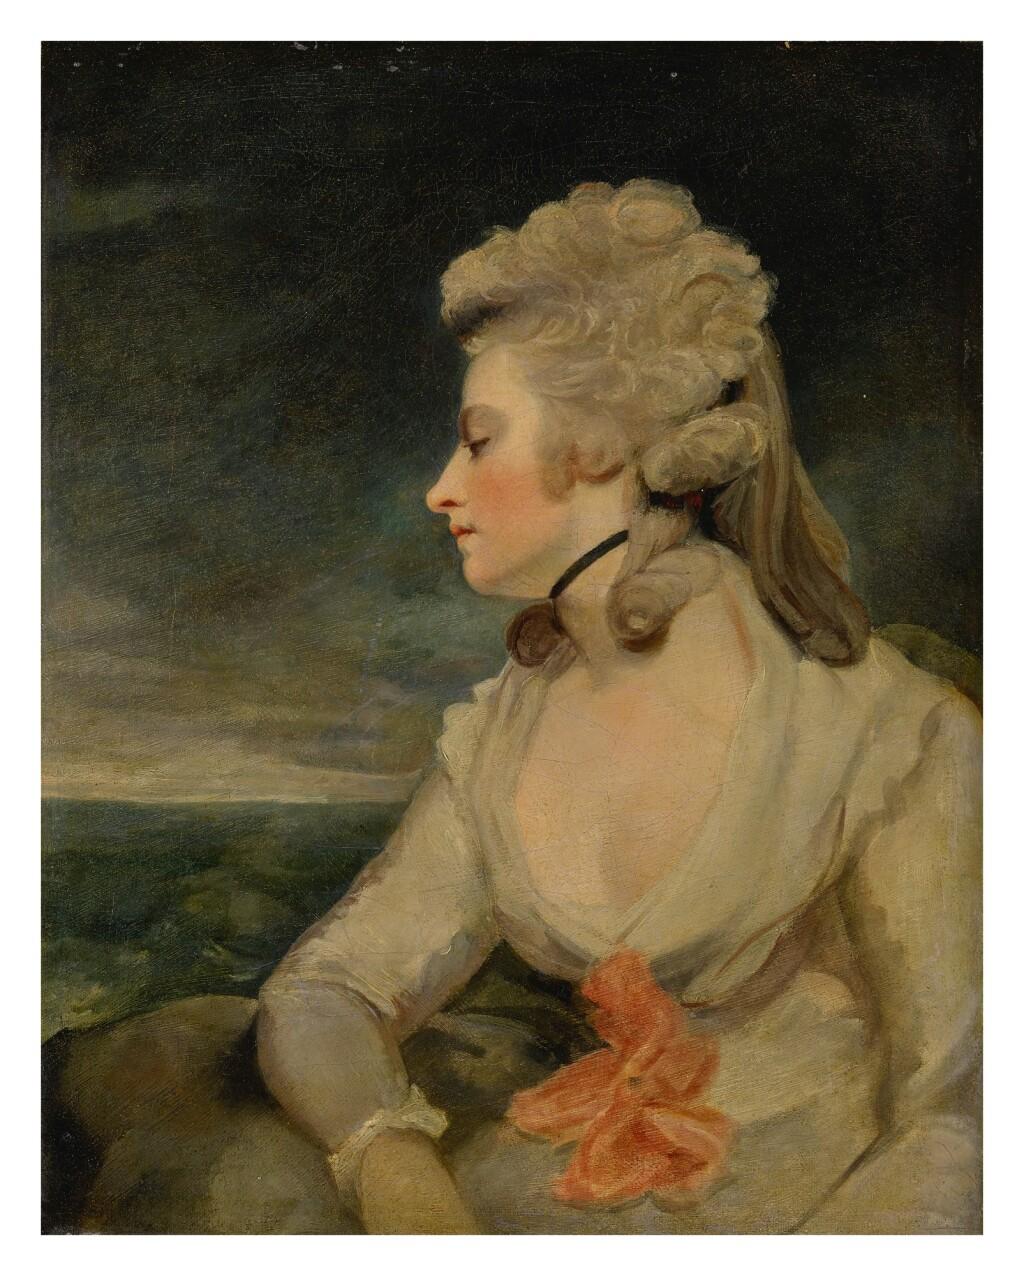 STUDIO OF SIR JOSHUA REYNOLDS, P.R.A.   PORTRAIT OF MRS. MARY ROBINSON